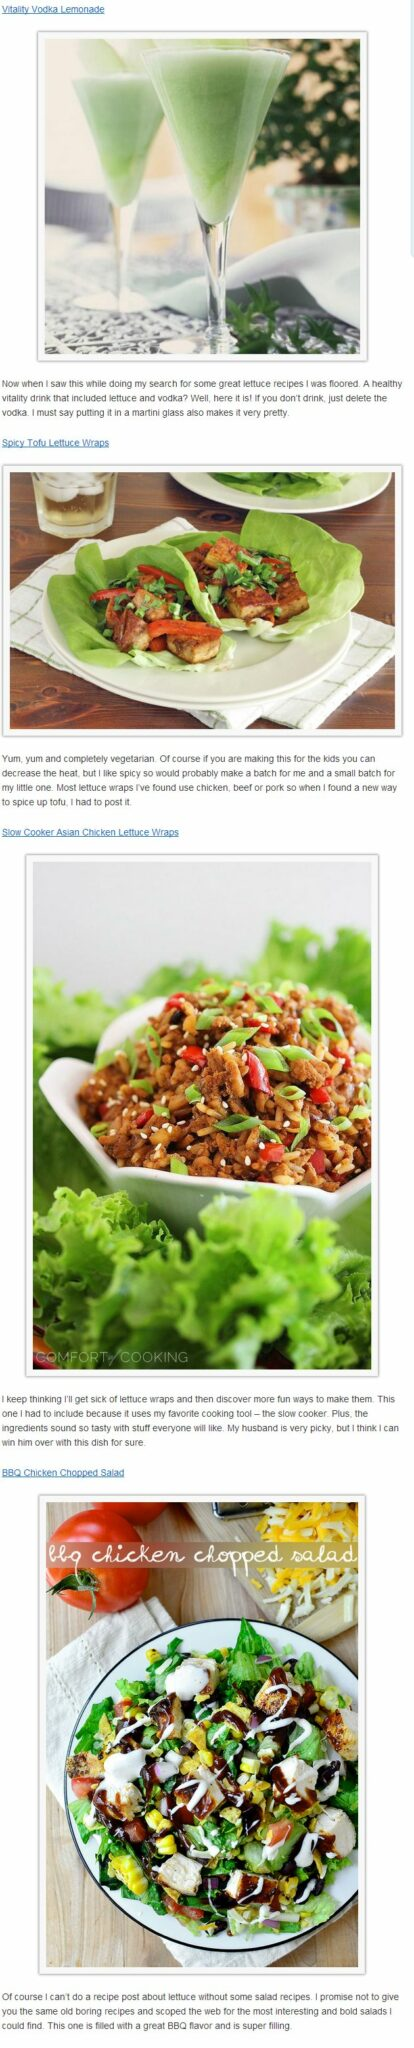 lelttuce healthy and recipes PART 2